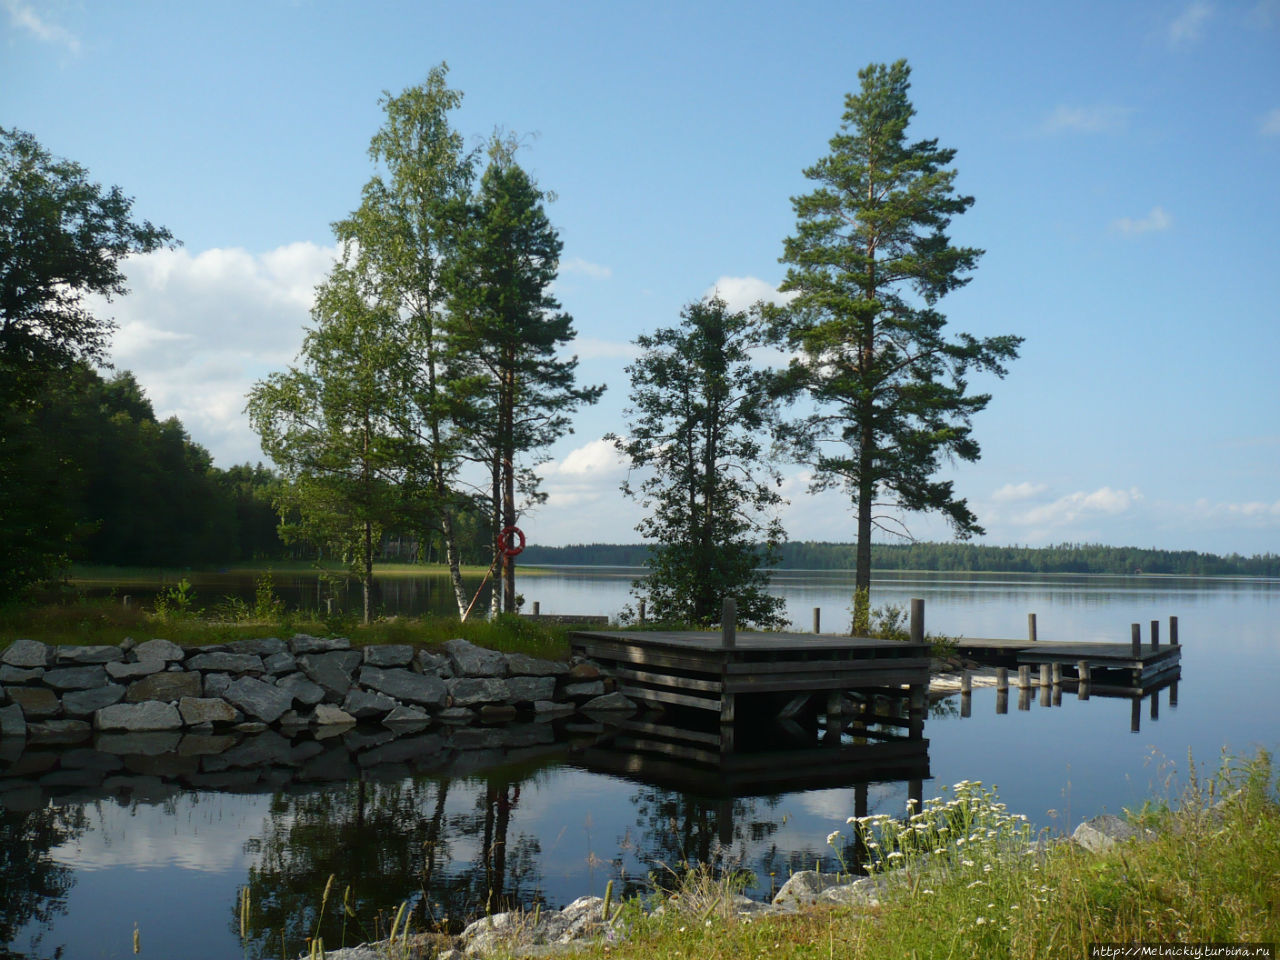 Канал Телатайпале Лохилахти, Финляндия